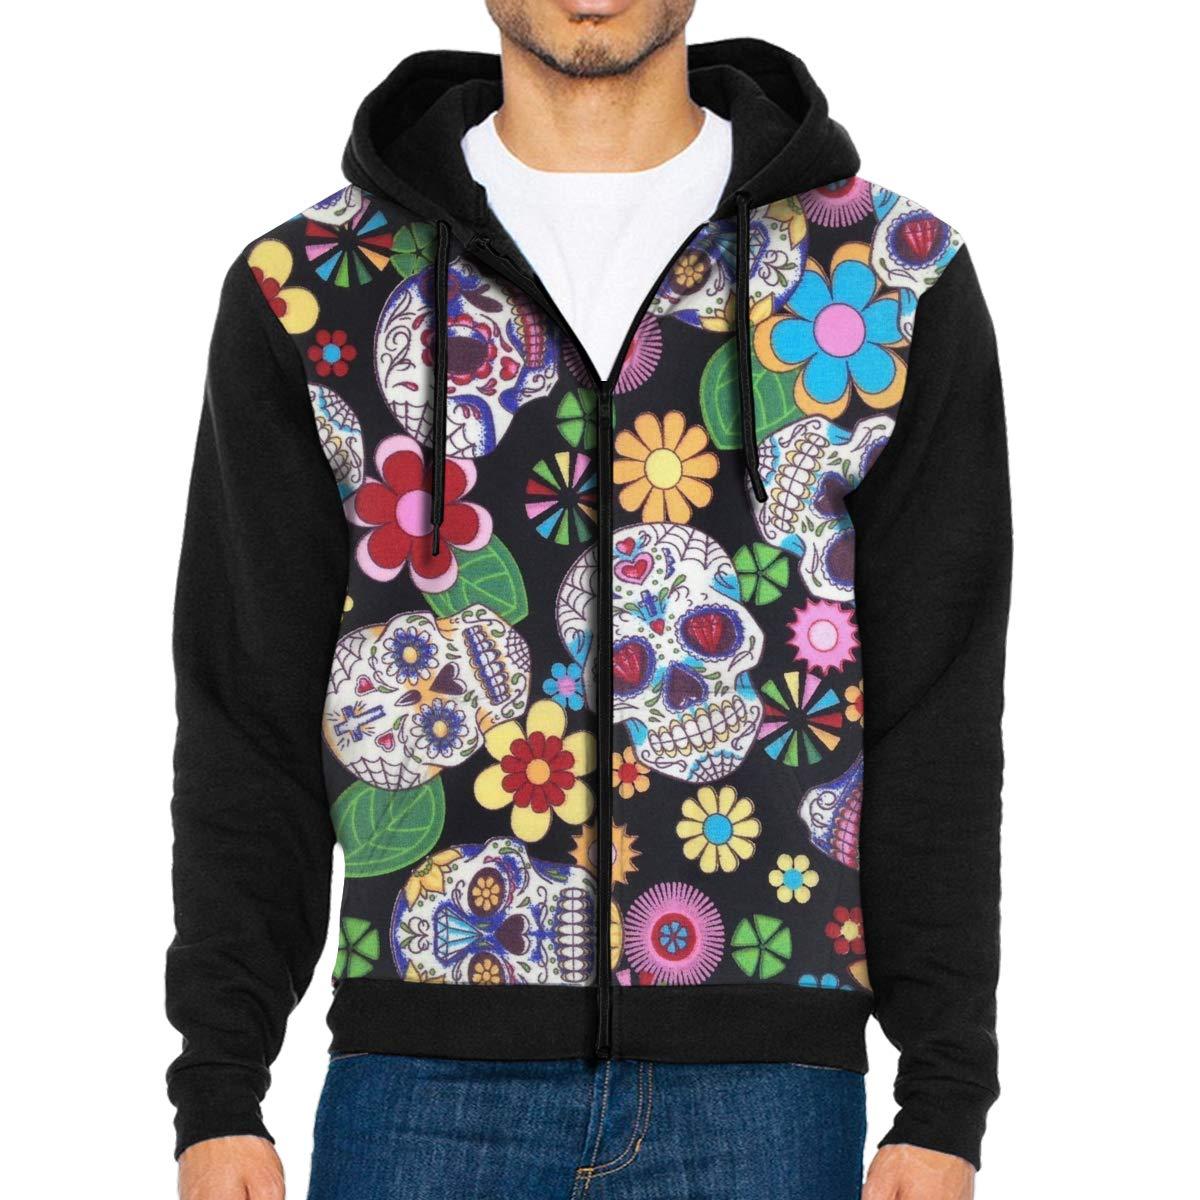 Men Pullover Hood Funky Sugar Skull Zip Hoodies Hooded Fashion Jackets Coats